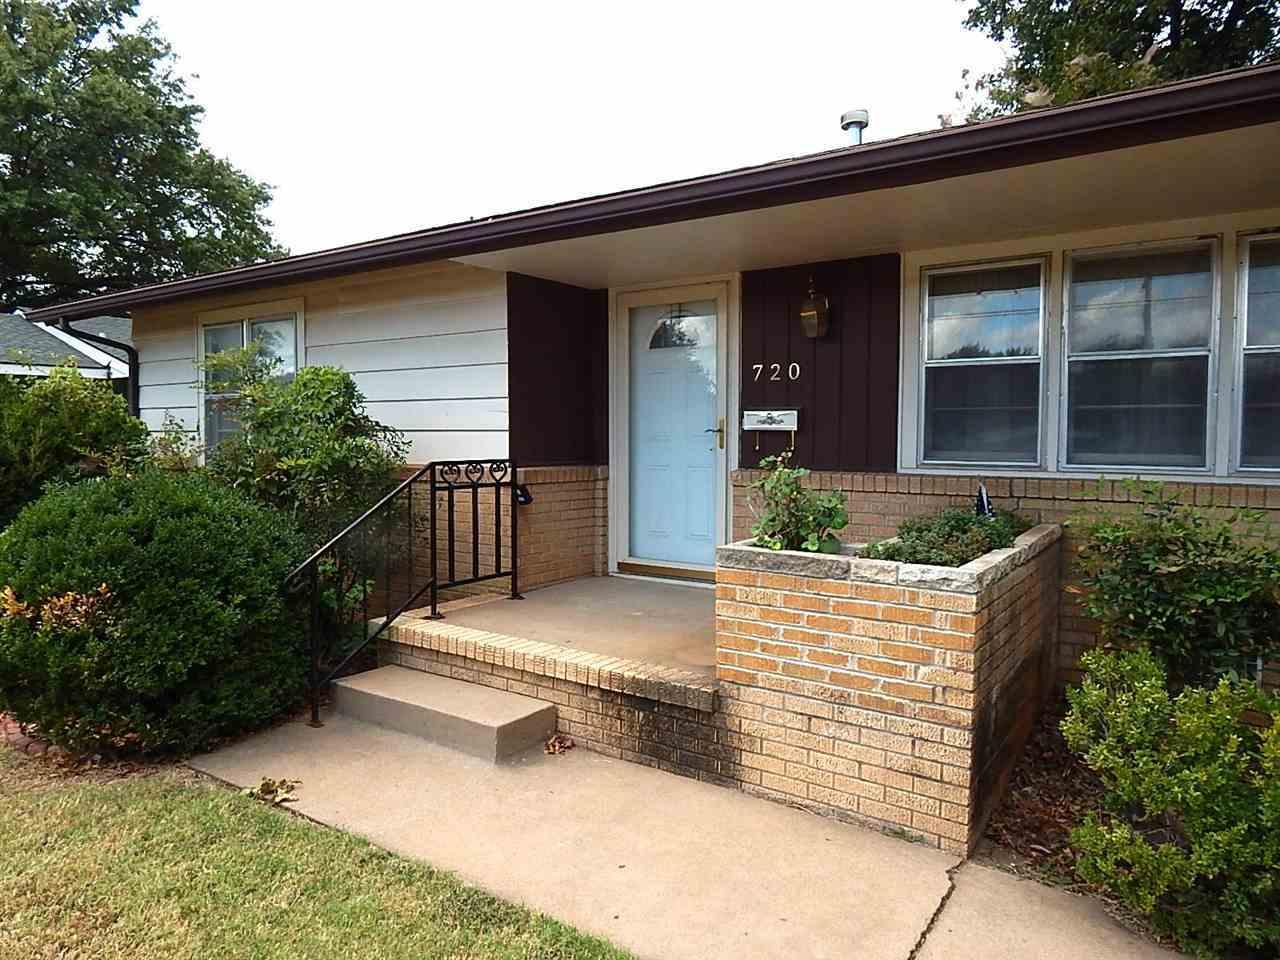 Sold Cross Sale W/ MLS | 720 N 14th Ponca City, OK 74601 1